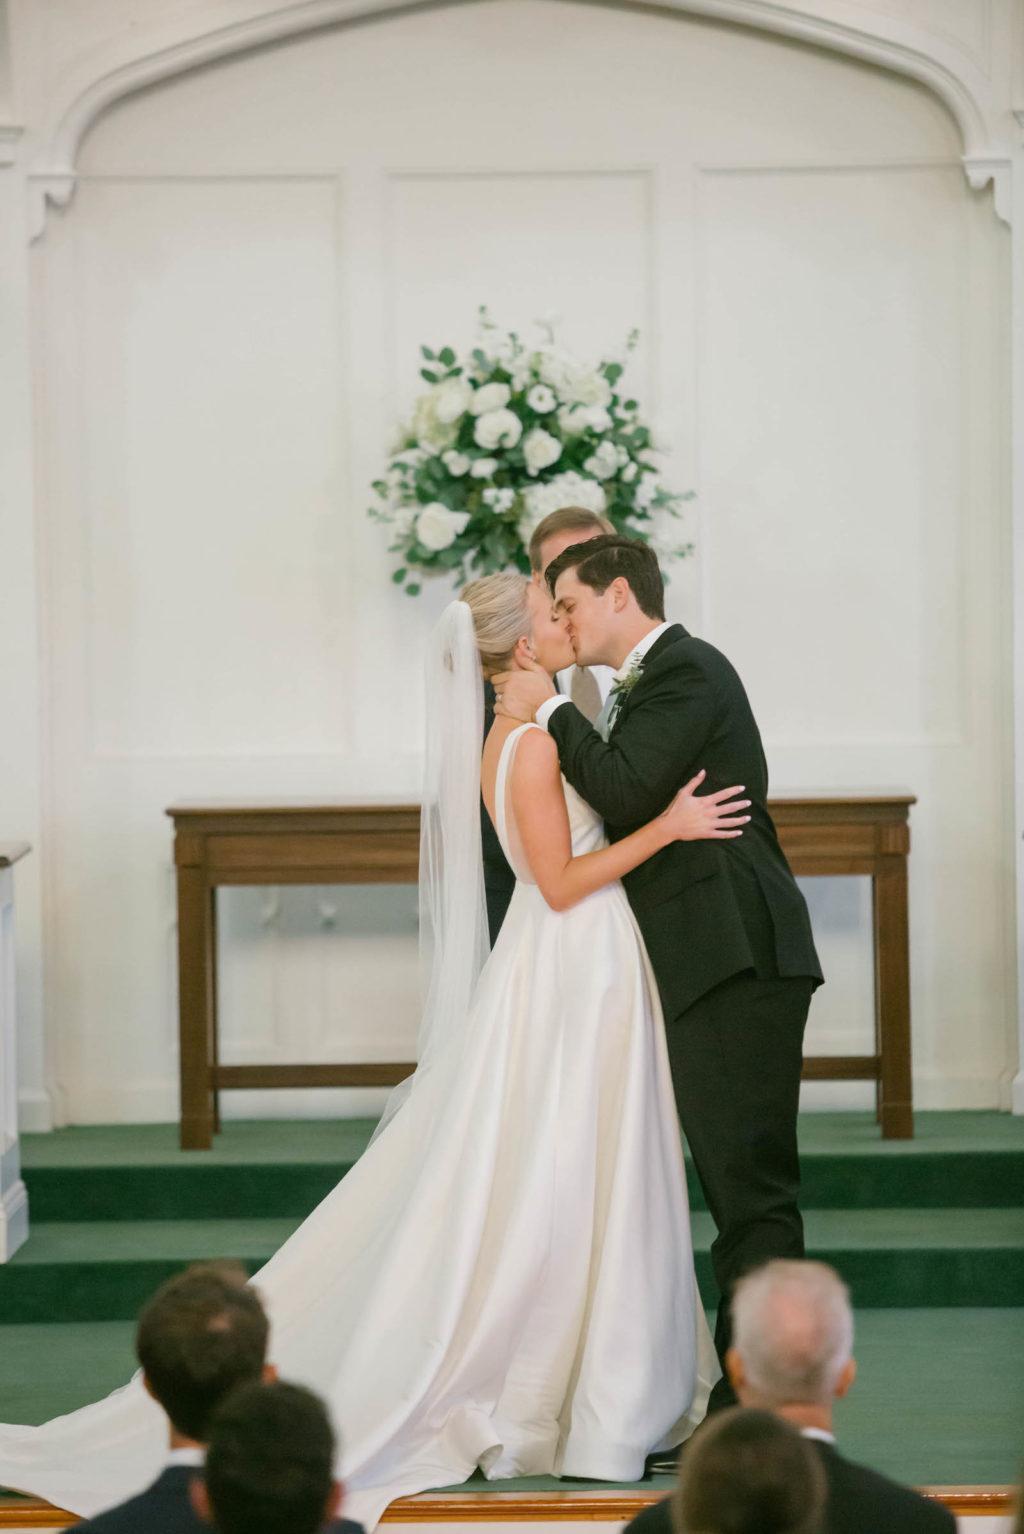 Bride and Groom First Kiss at the Altar | South Tampa Holy Trinity Presbyterian Church Wedding Ceremony